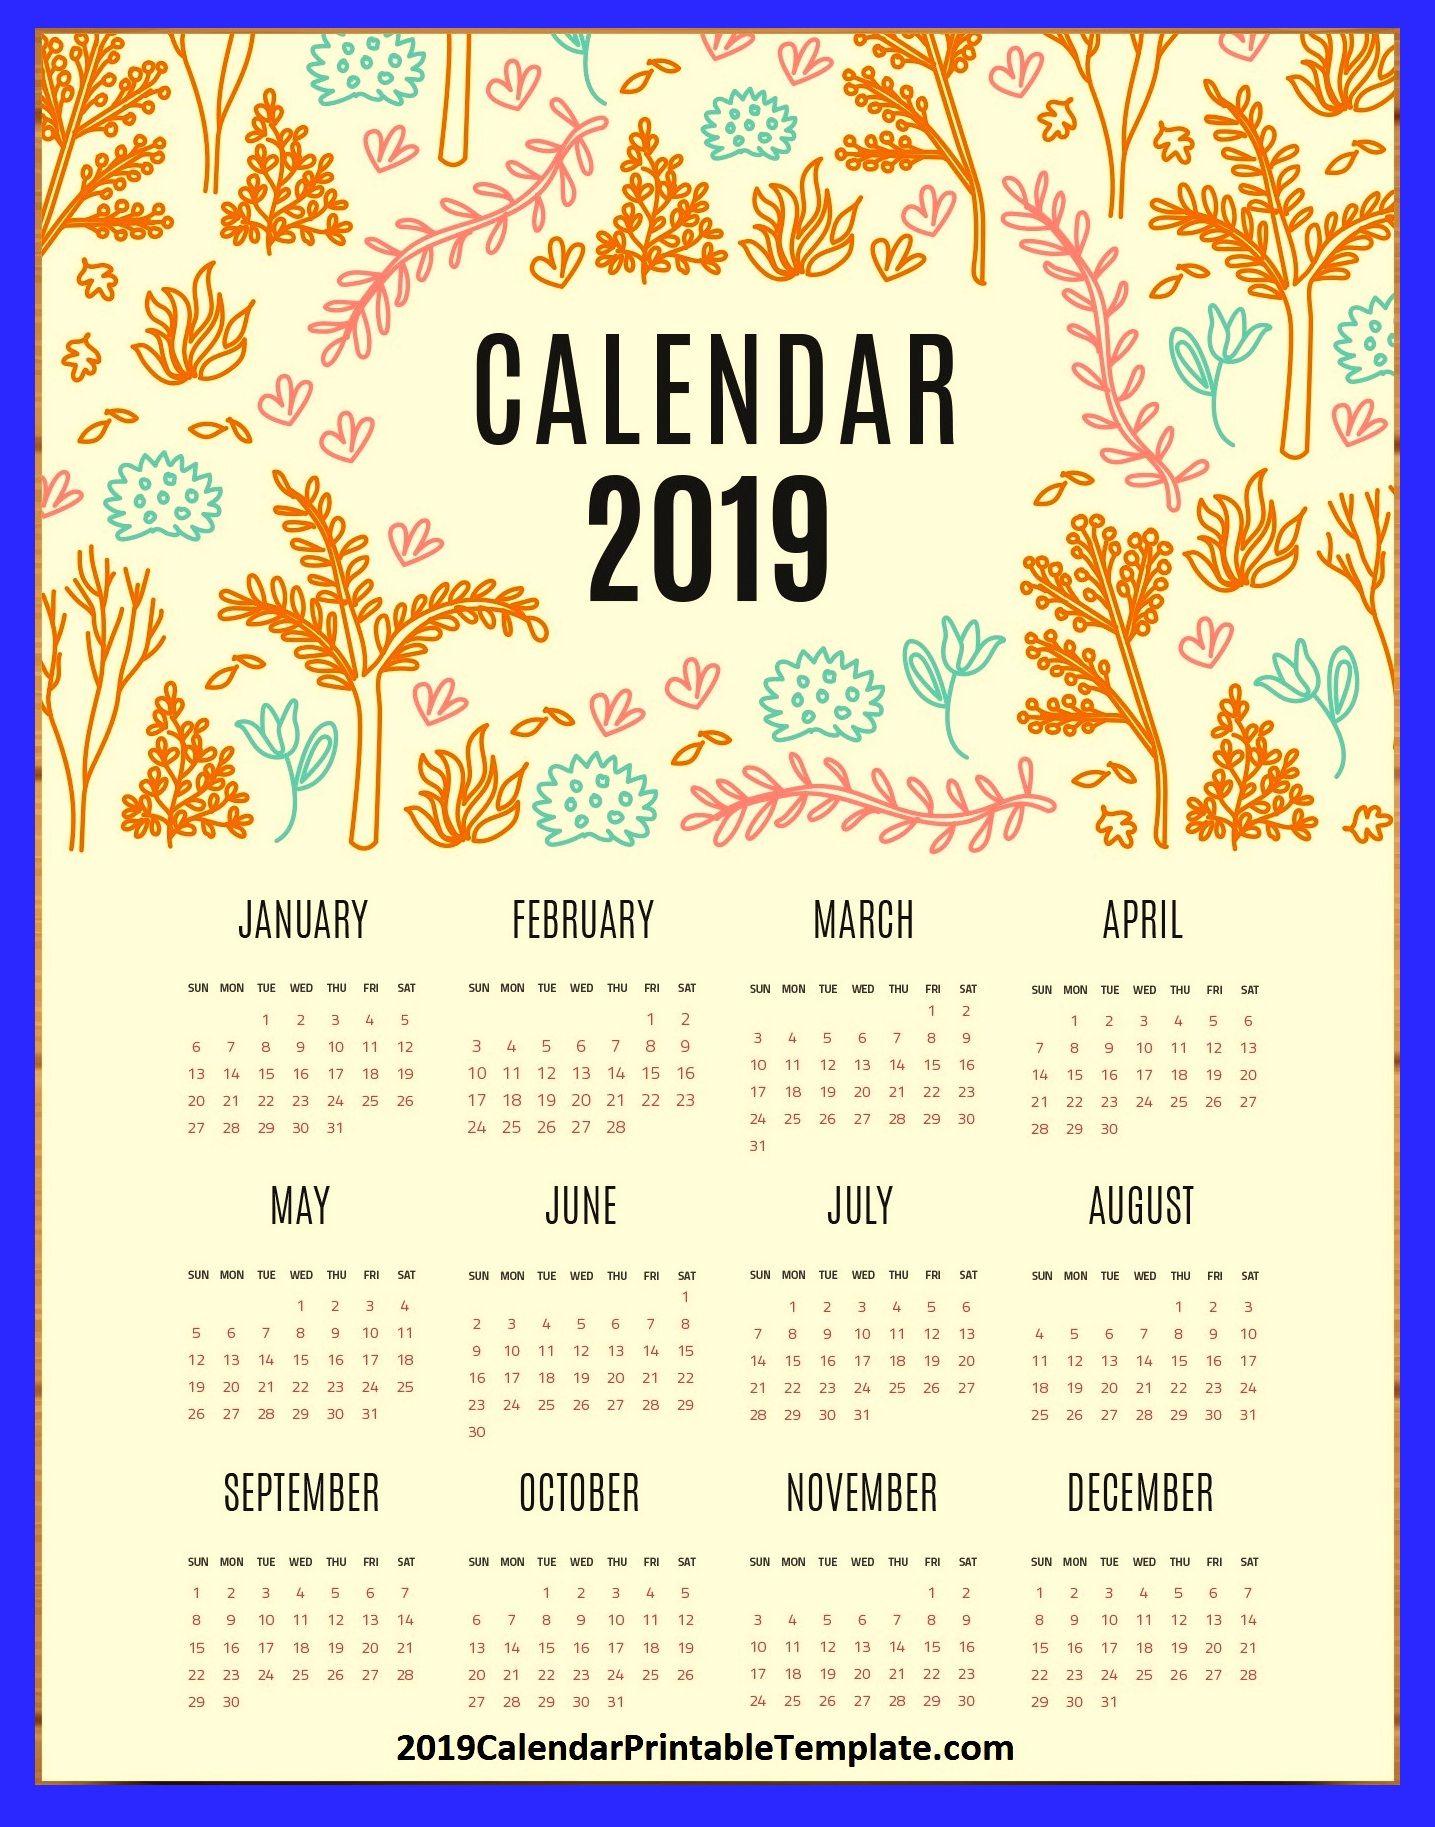 2019 Calendar Usa Printable Template Holidays Https://Www regarding Federal Government Calendar Printable